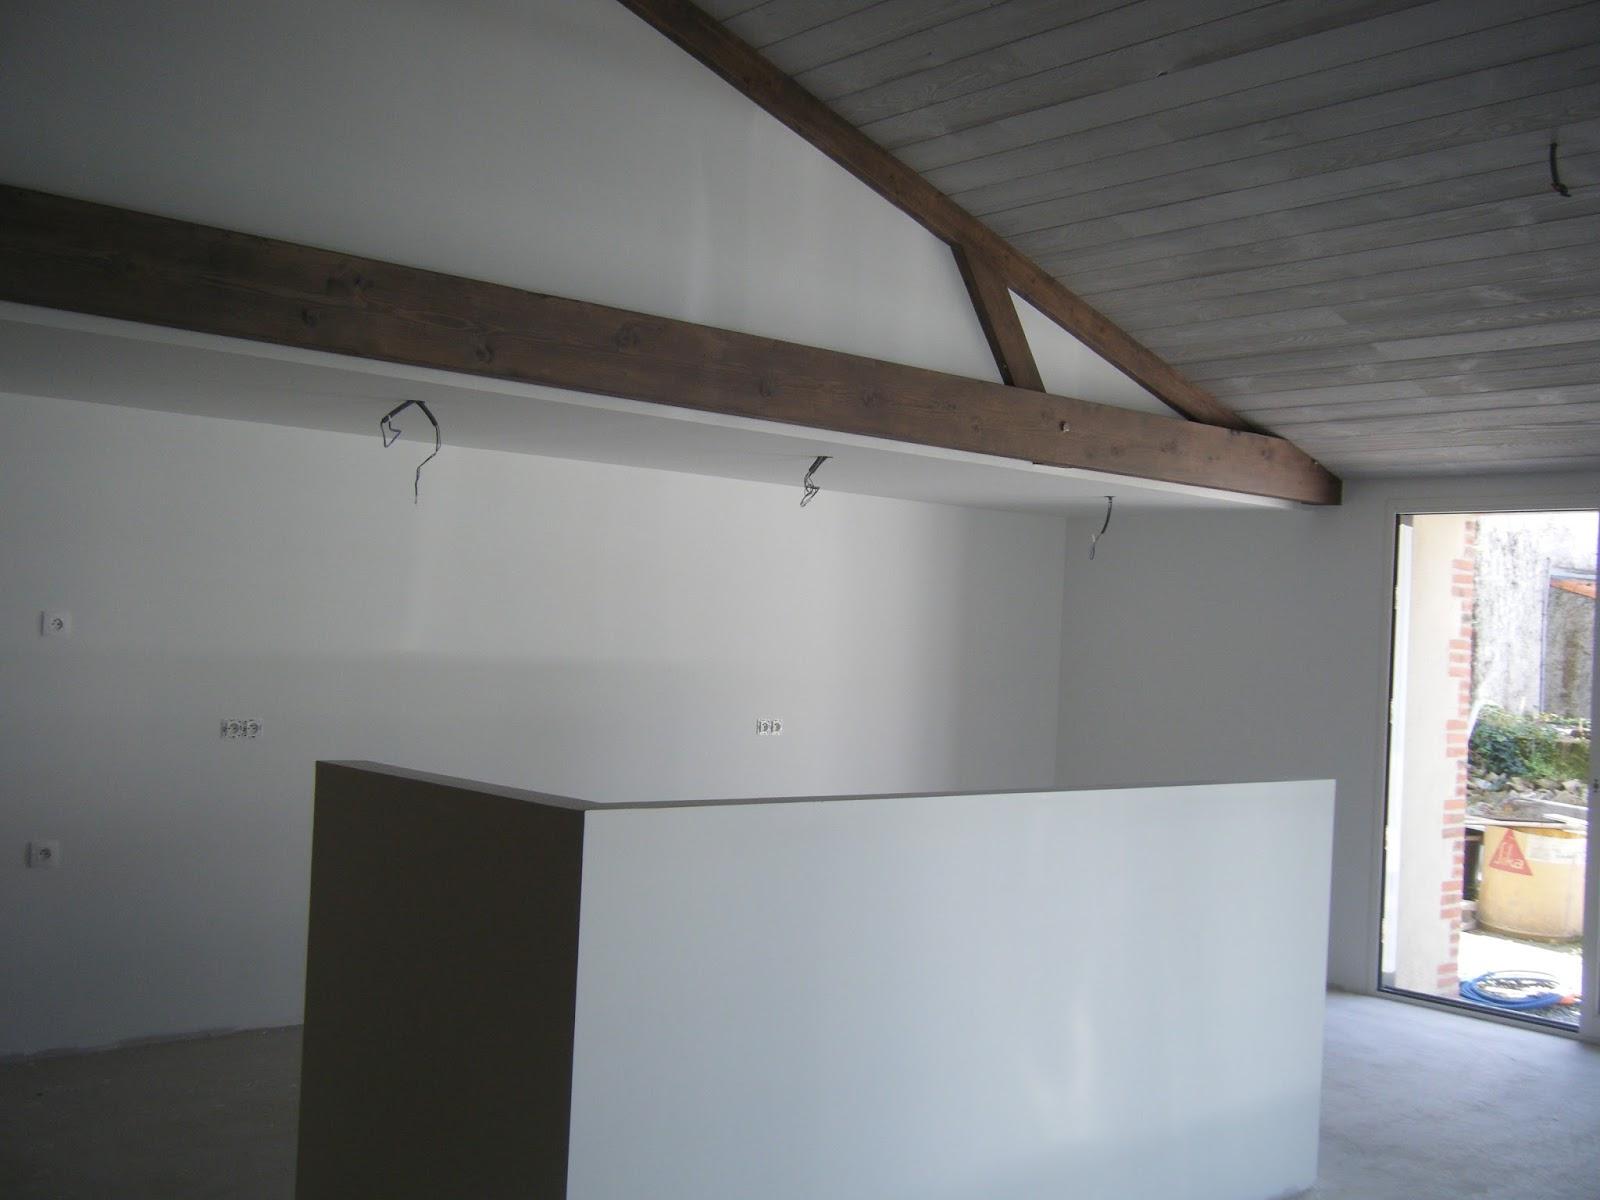 plafond de cuisine en lambris. Black Bedroom Furniture Sets. Home Design Ideas